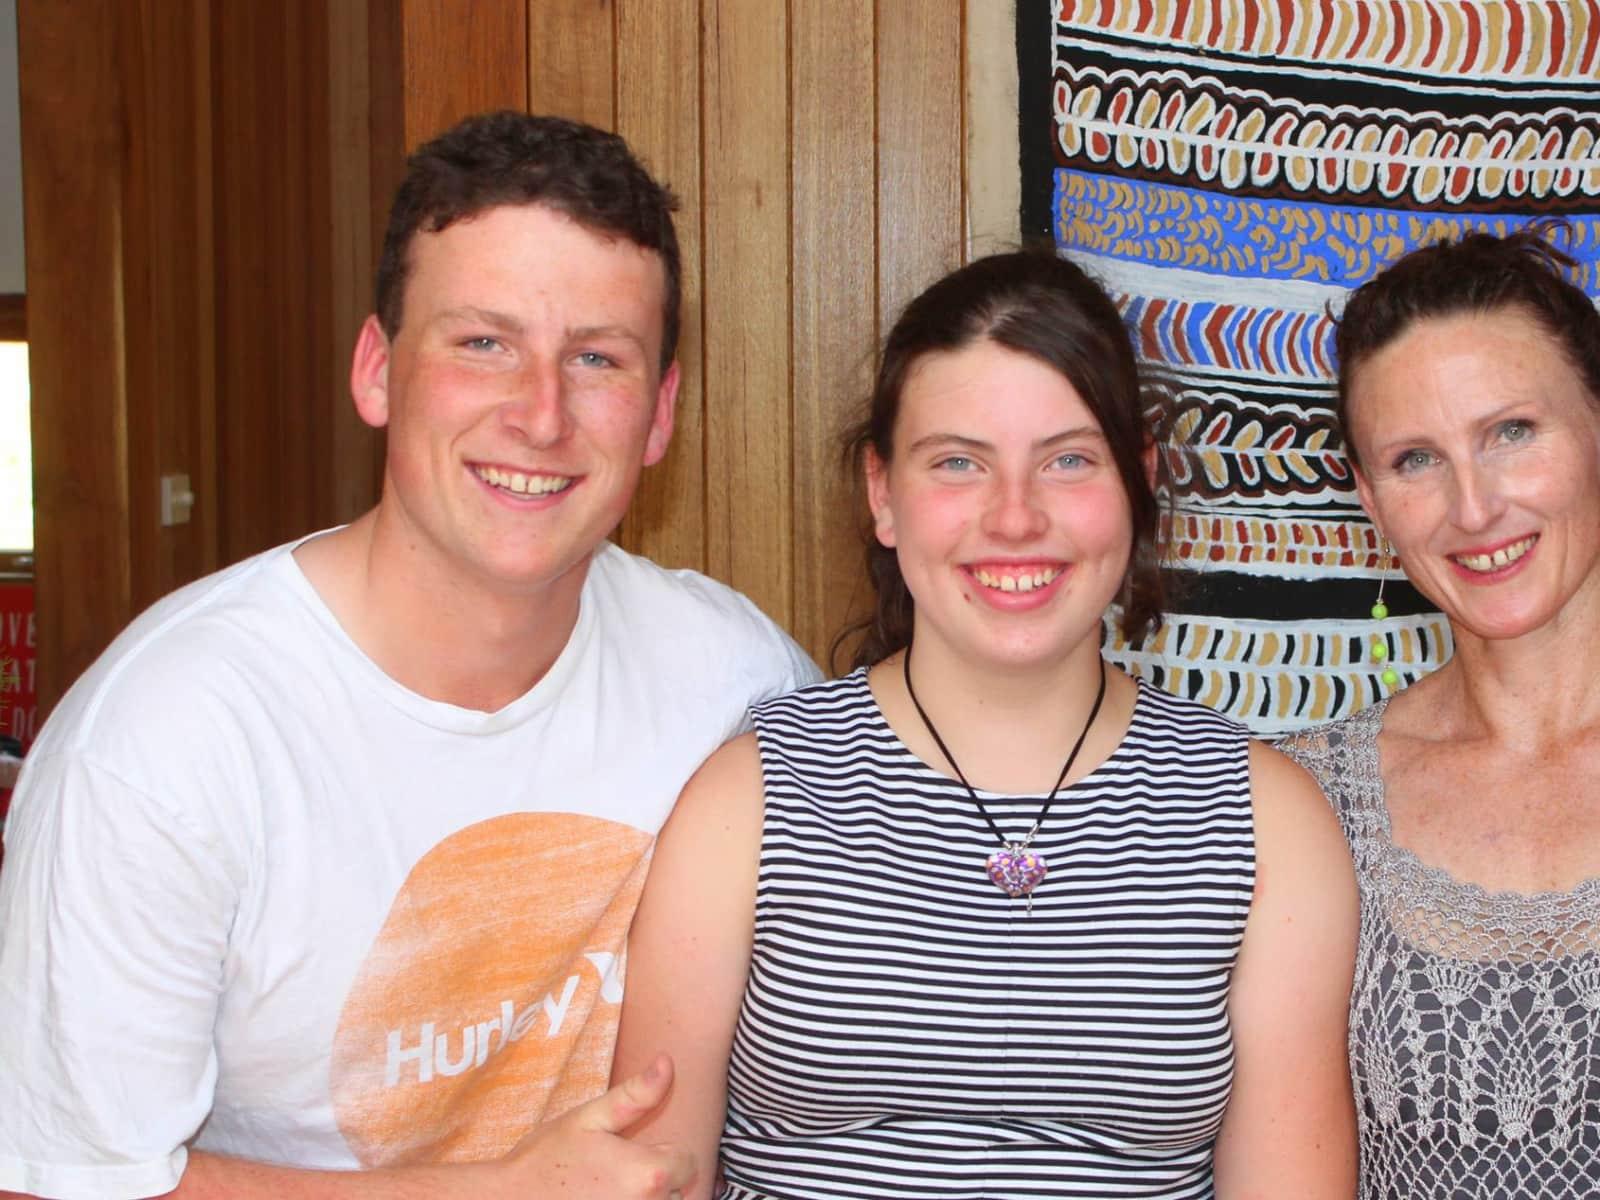 Shannon from Hobart, Tasmania, Australia